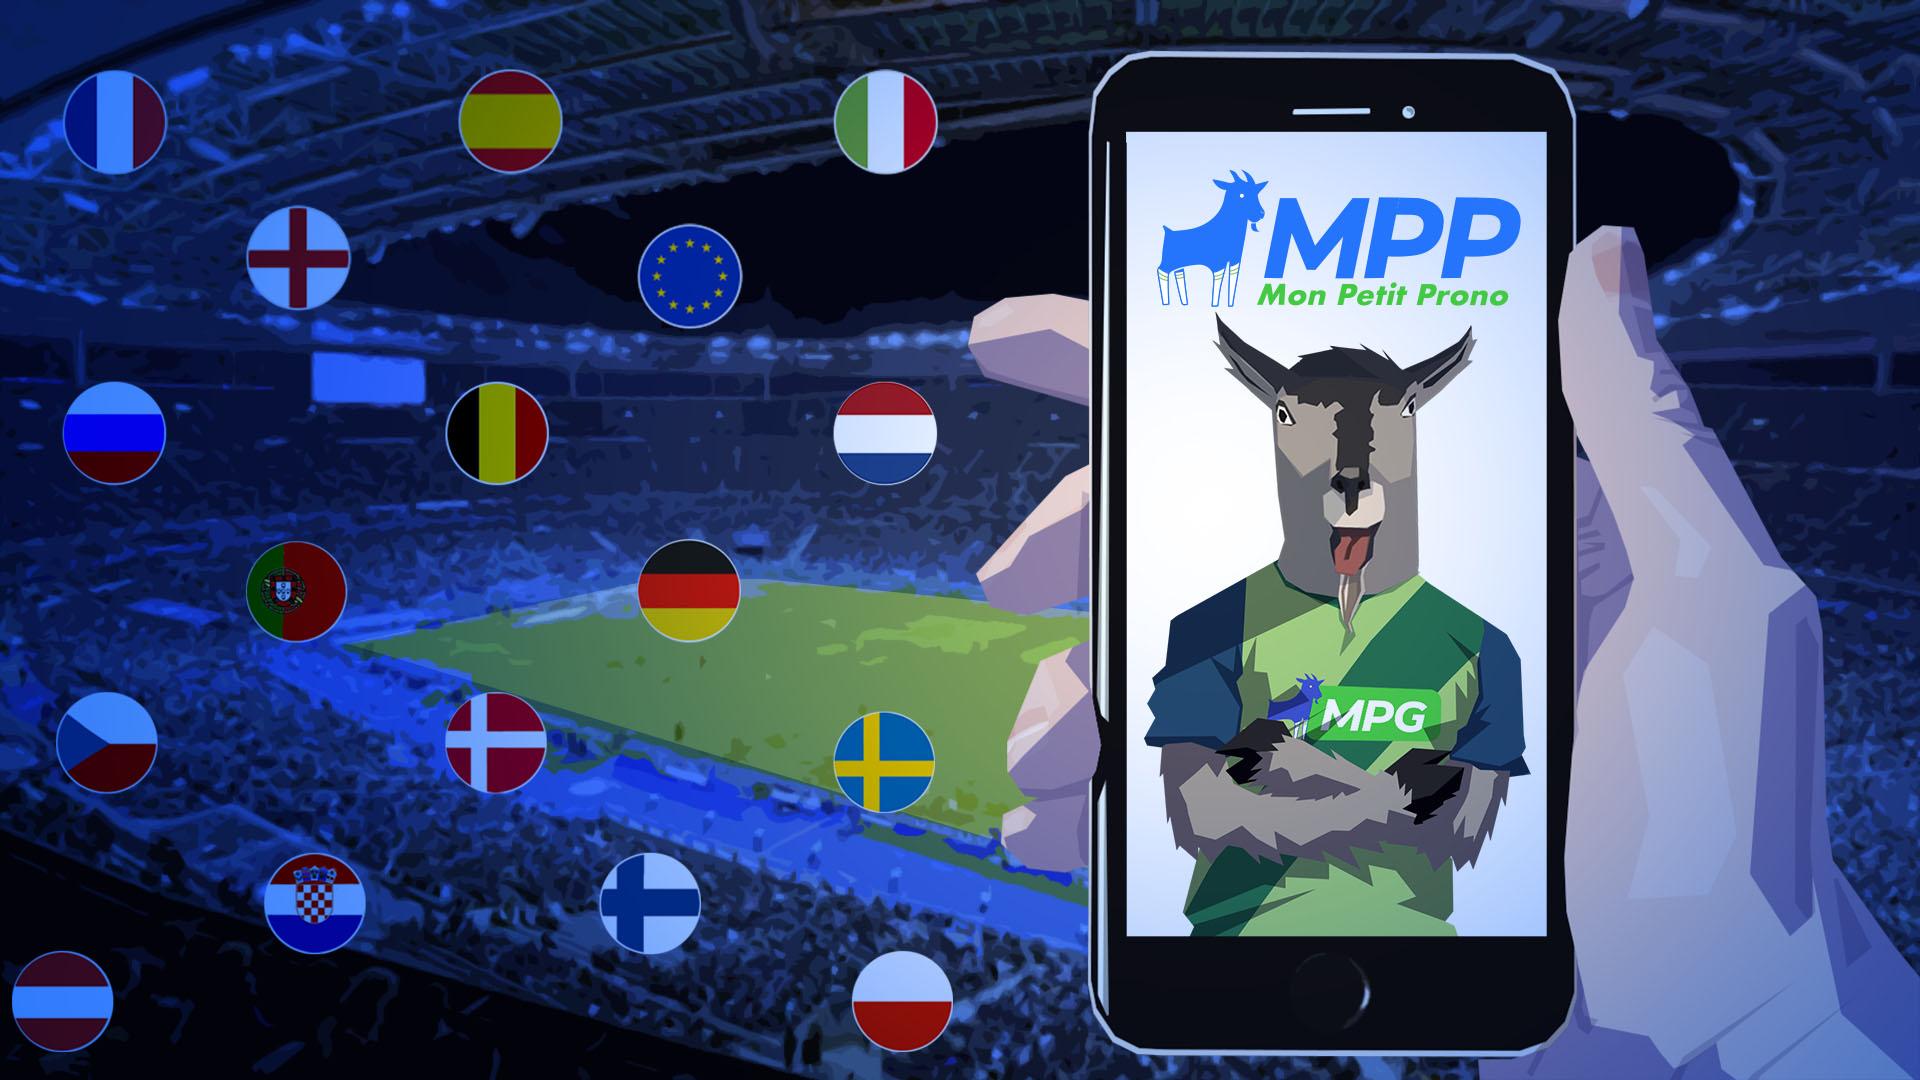 MPP dans les stades.jpg